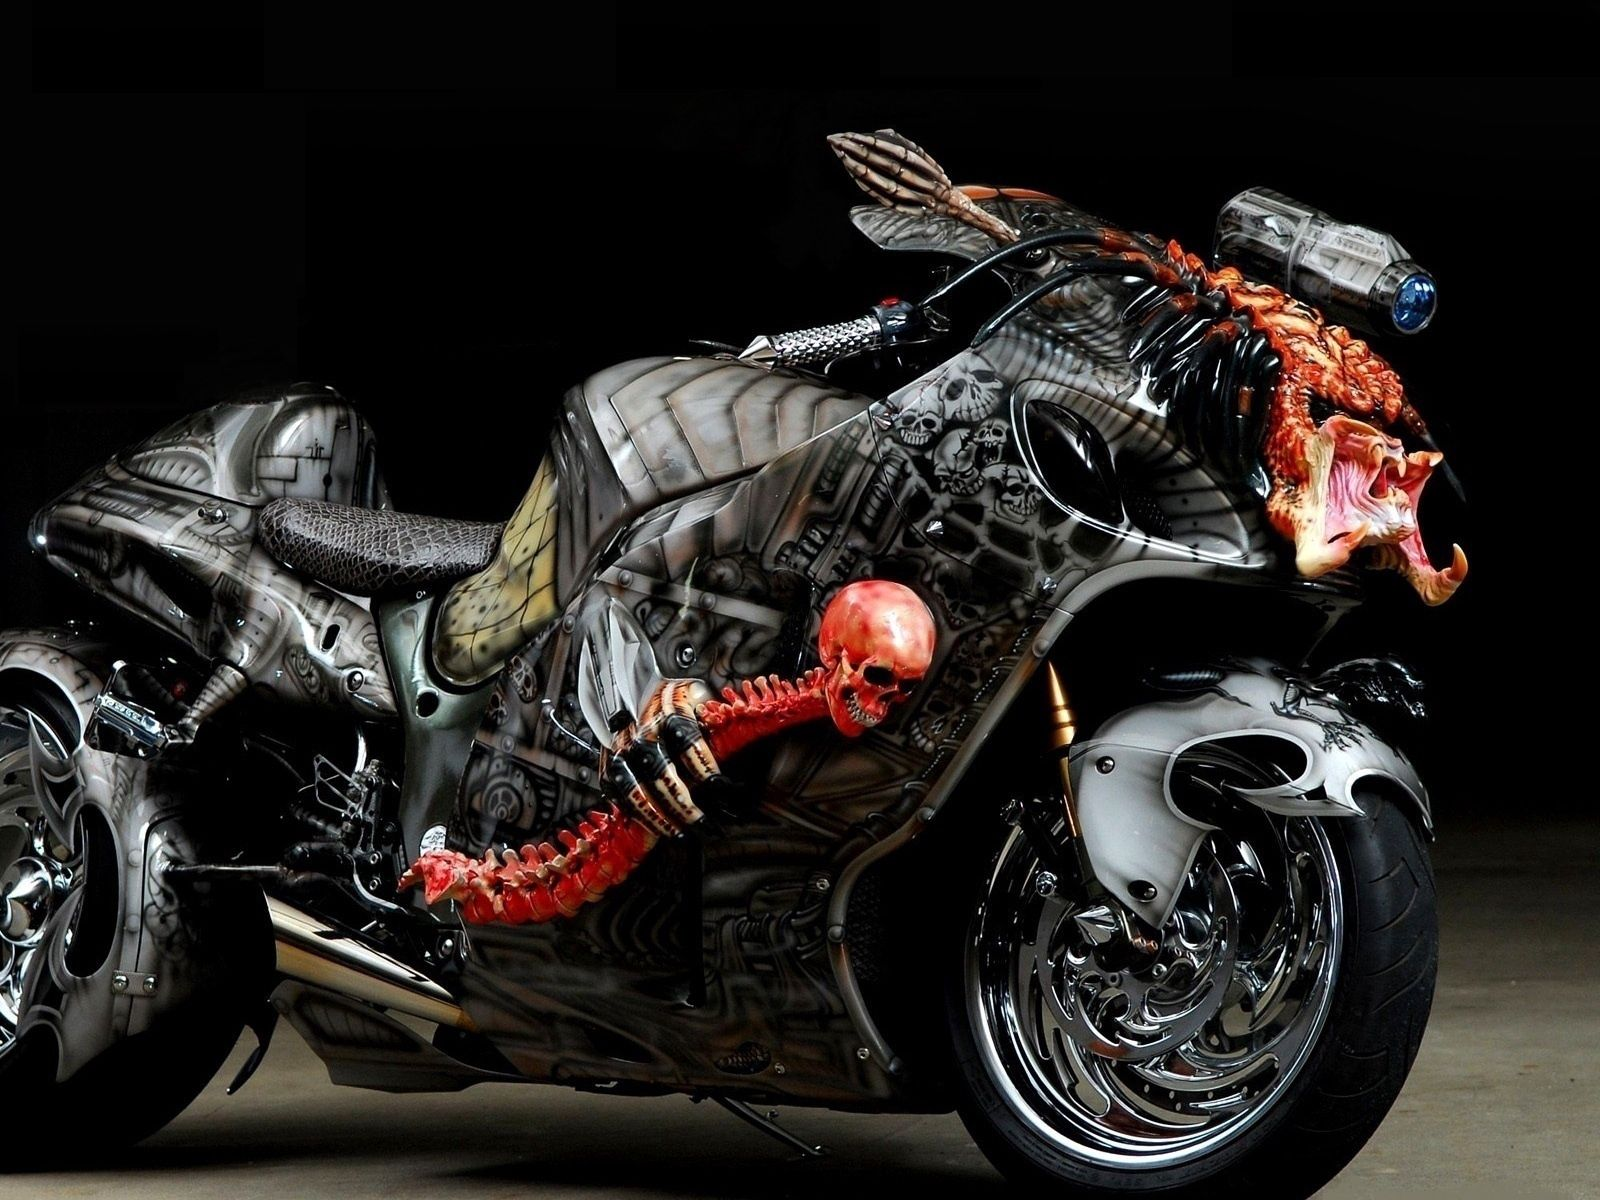 1600x1200 Wallpaper tuning, sport bike, airbrush, design